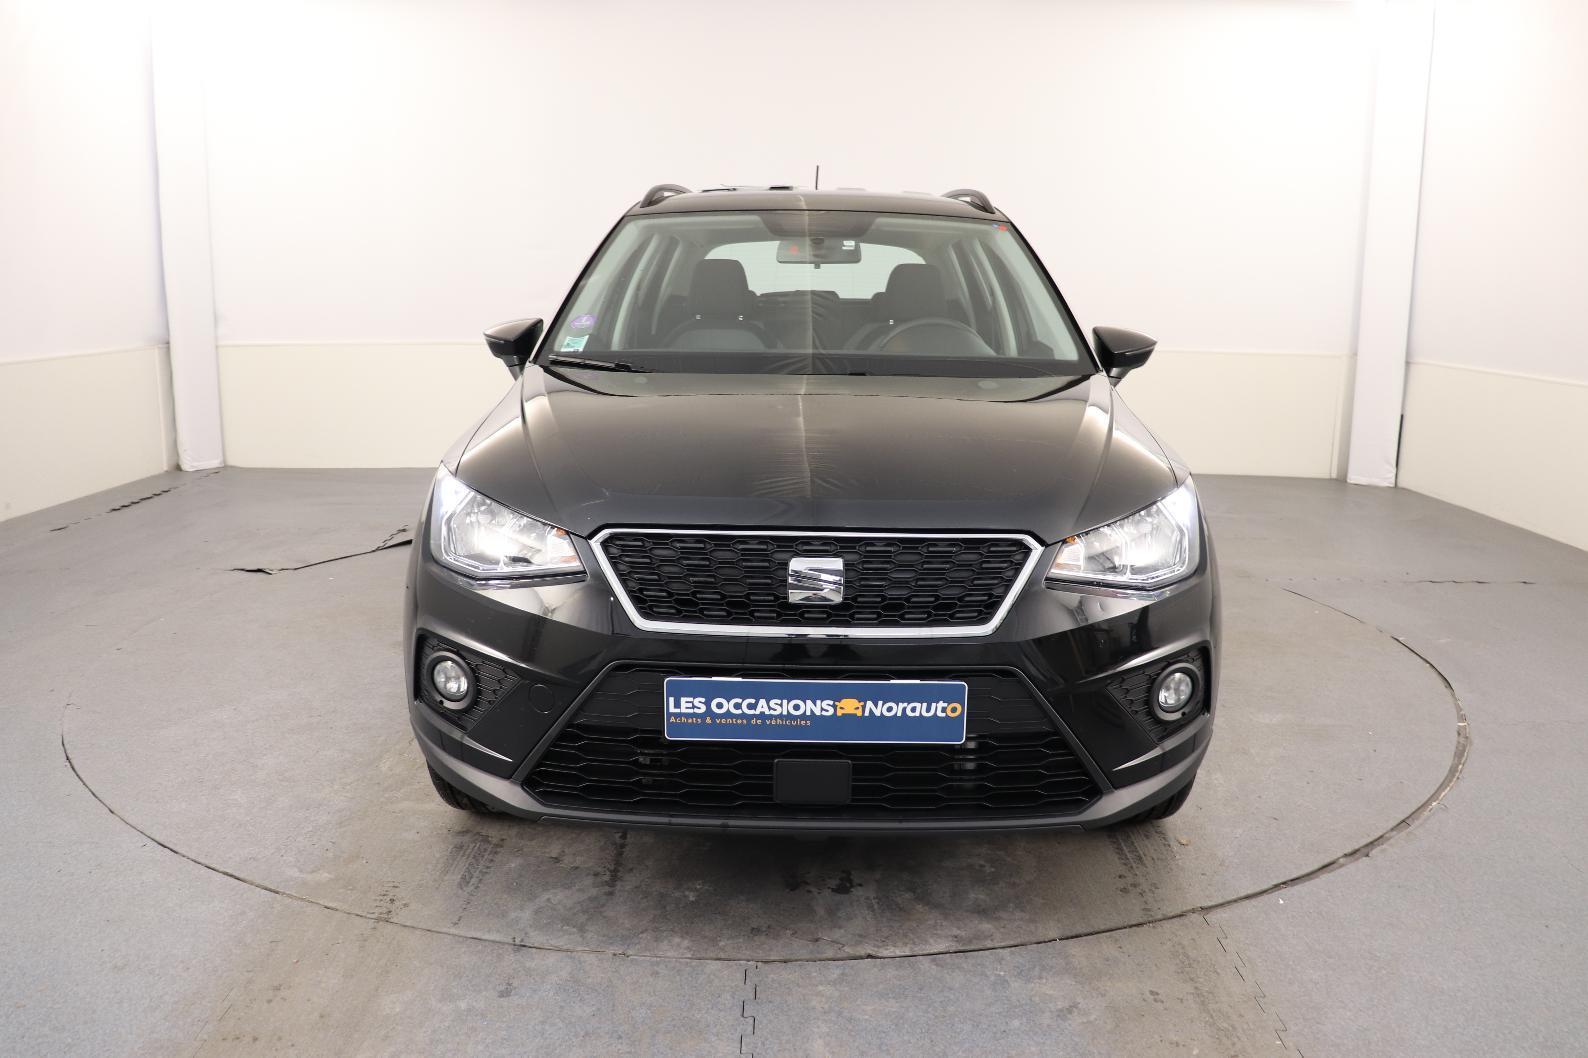 SEAT Arona 1.0 EcoTSI 115 ch Start/Stop BVM6 Style